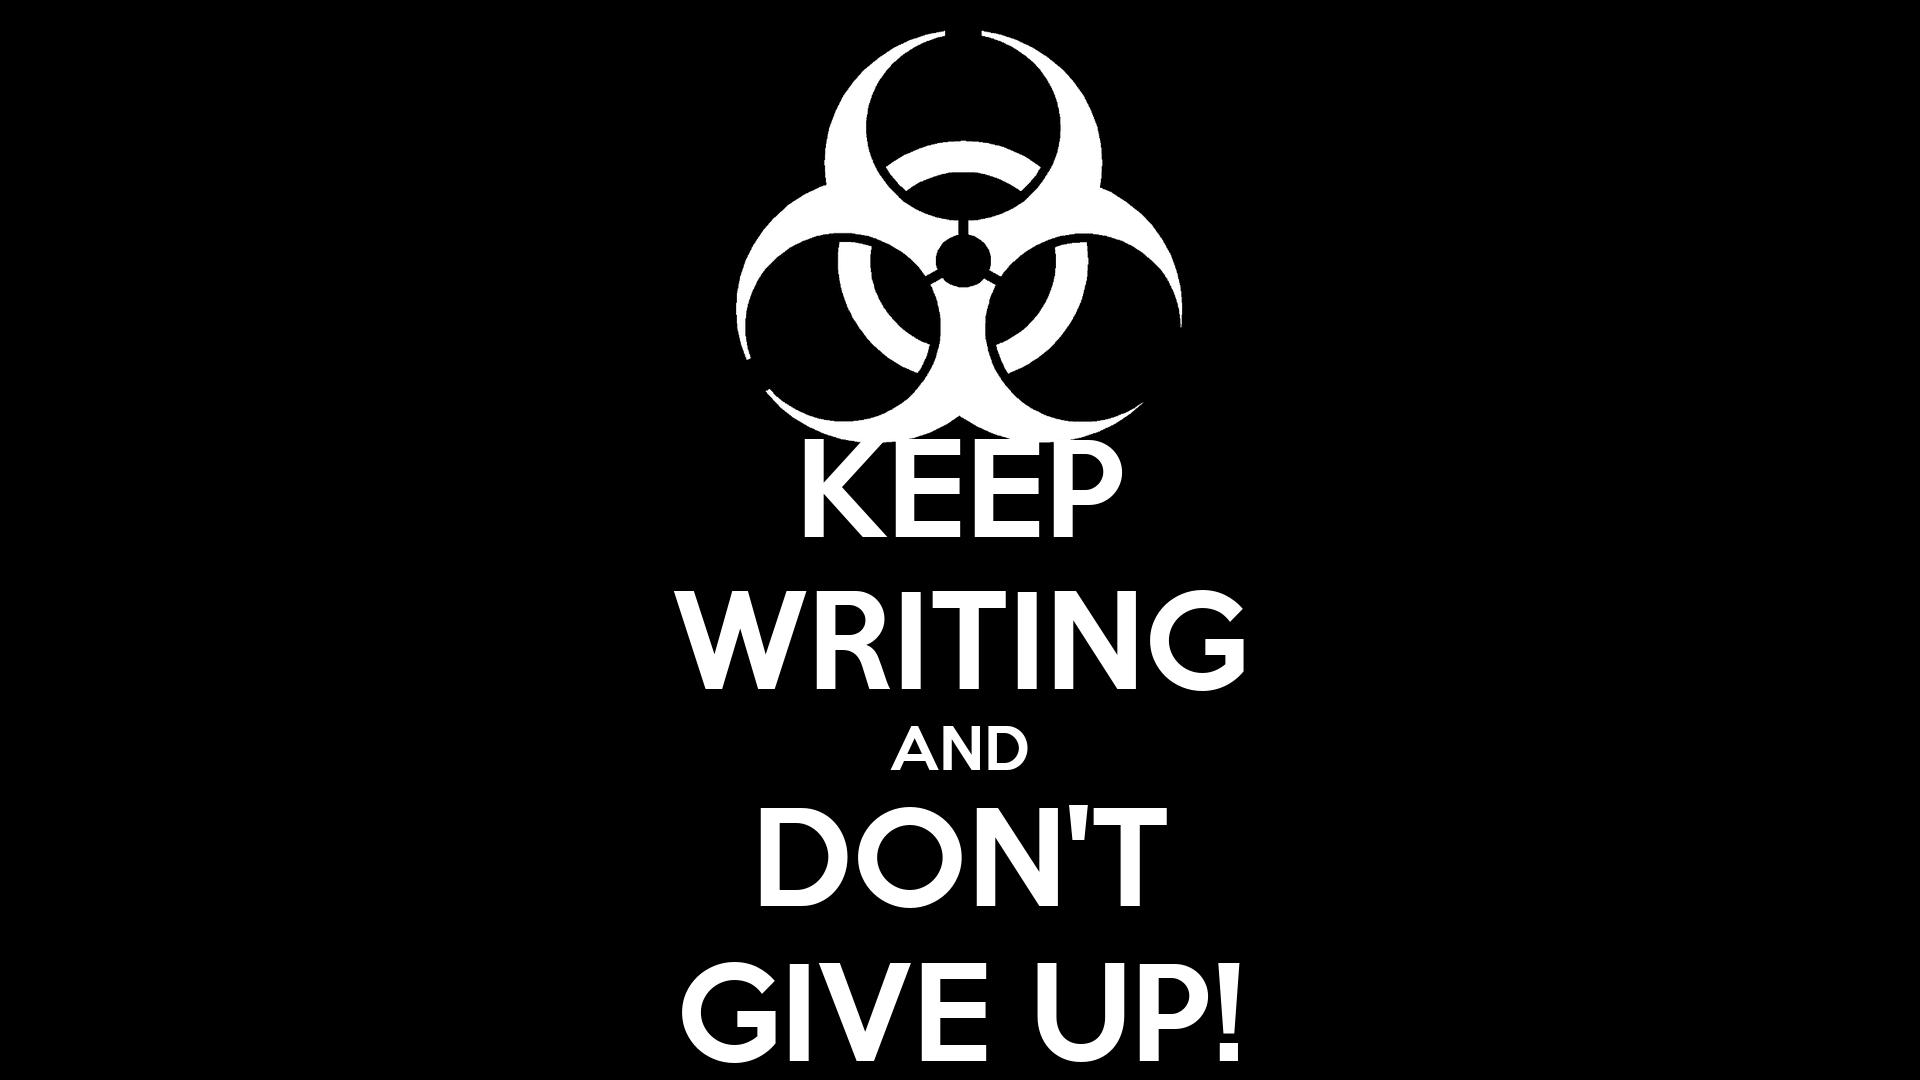 KEEP CALM AND love WRITING Poster   YEJIN   Keep Calm-o-Matic